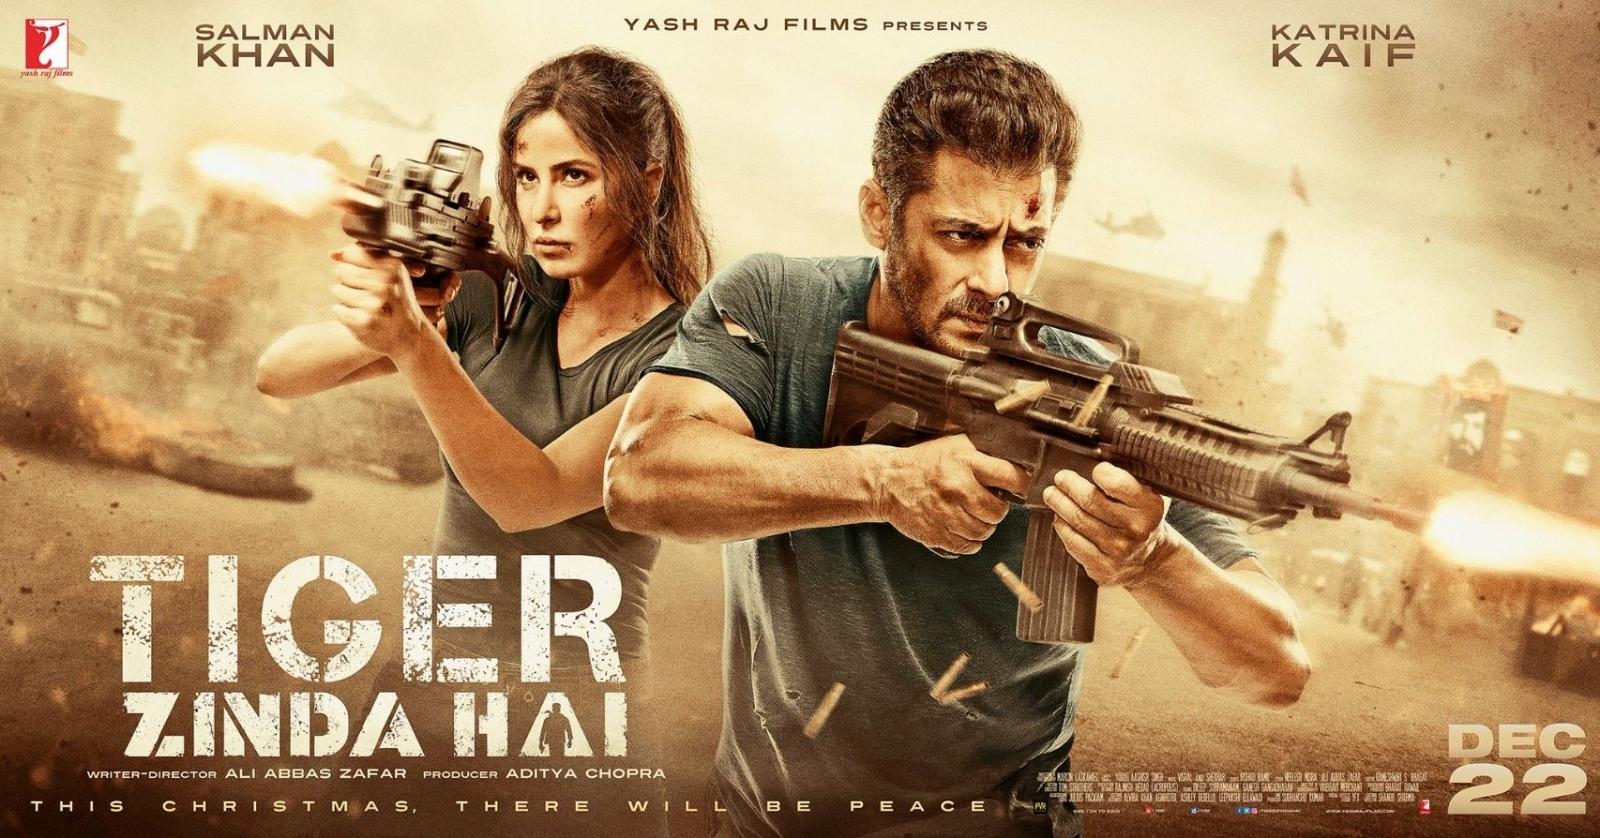 Salman Khan Roars With Tiger Zinda Hai Trailer, But